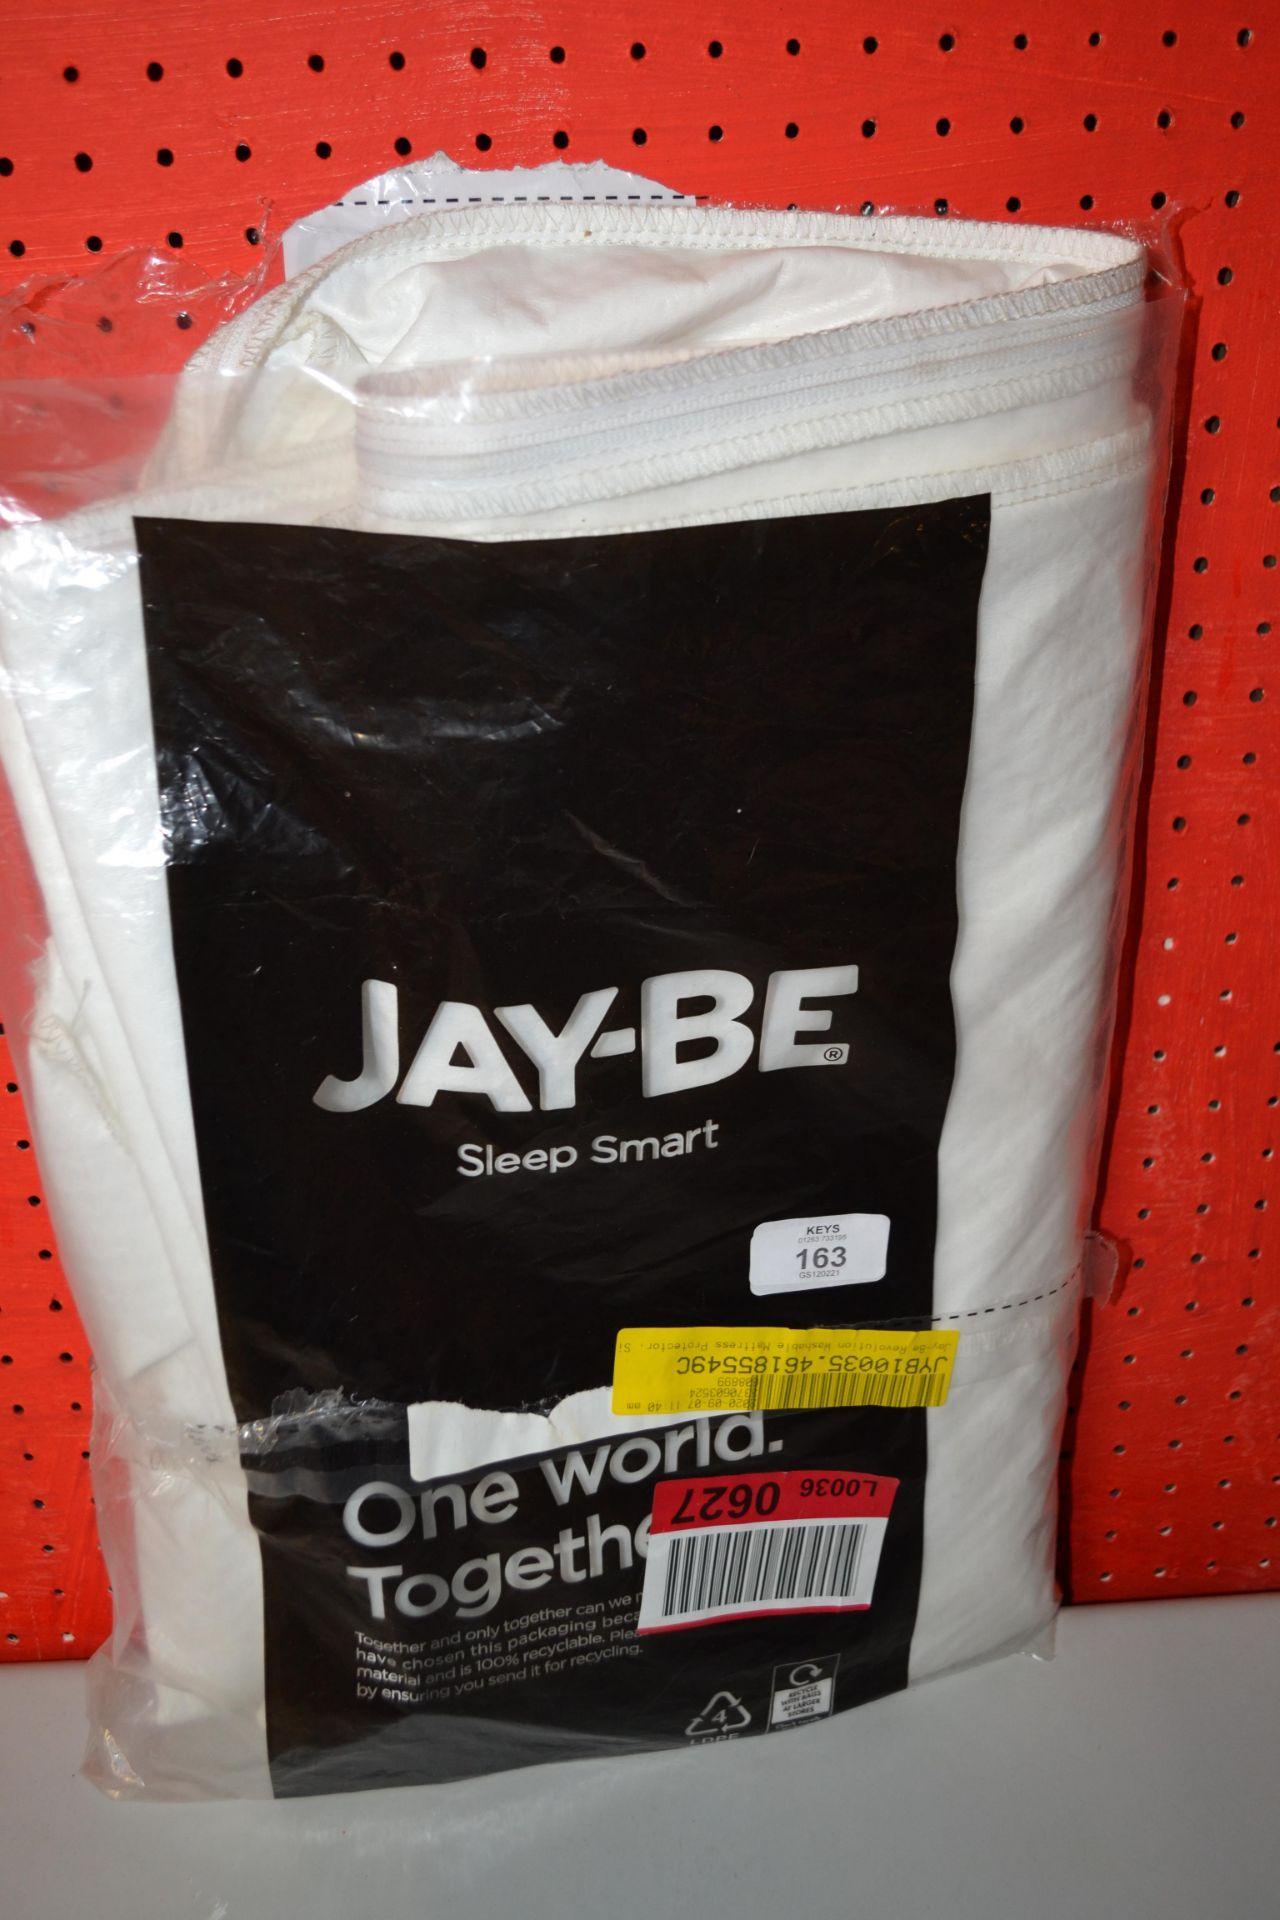 JAY-BE REVOLUTION WASHABLE MATTRESS PROTECTOR